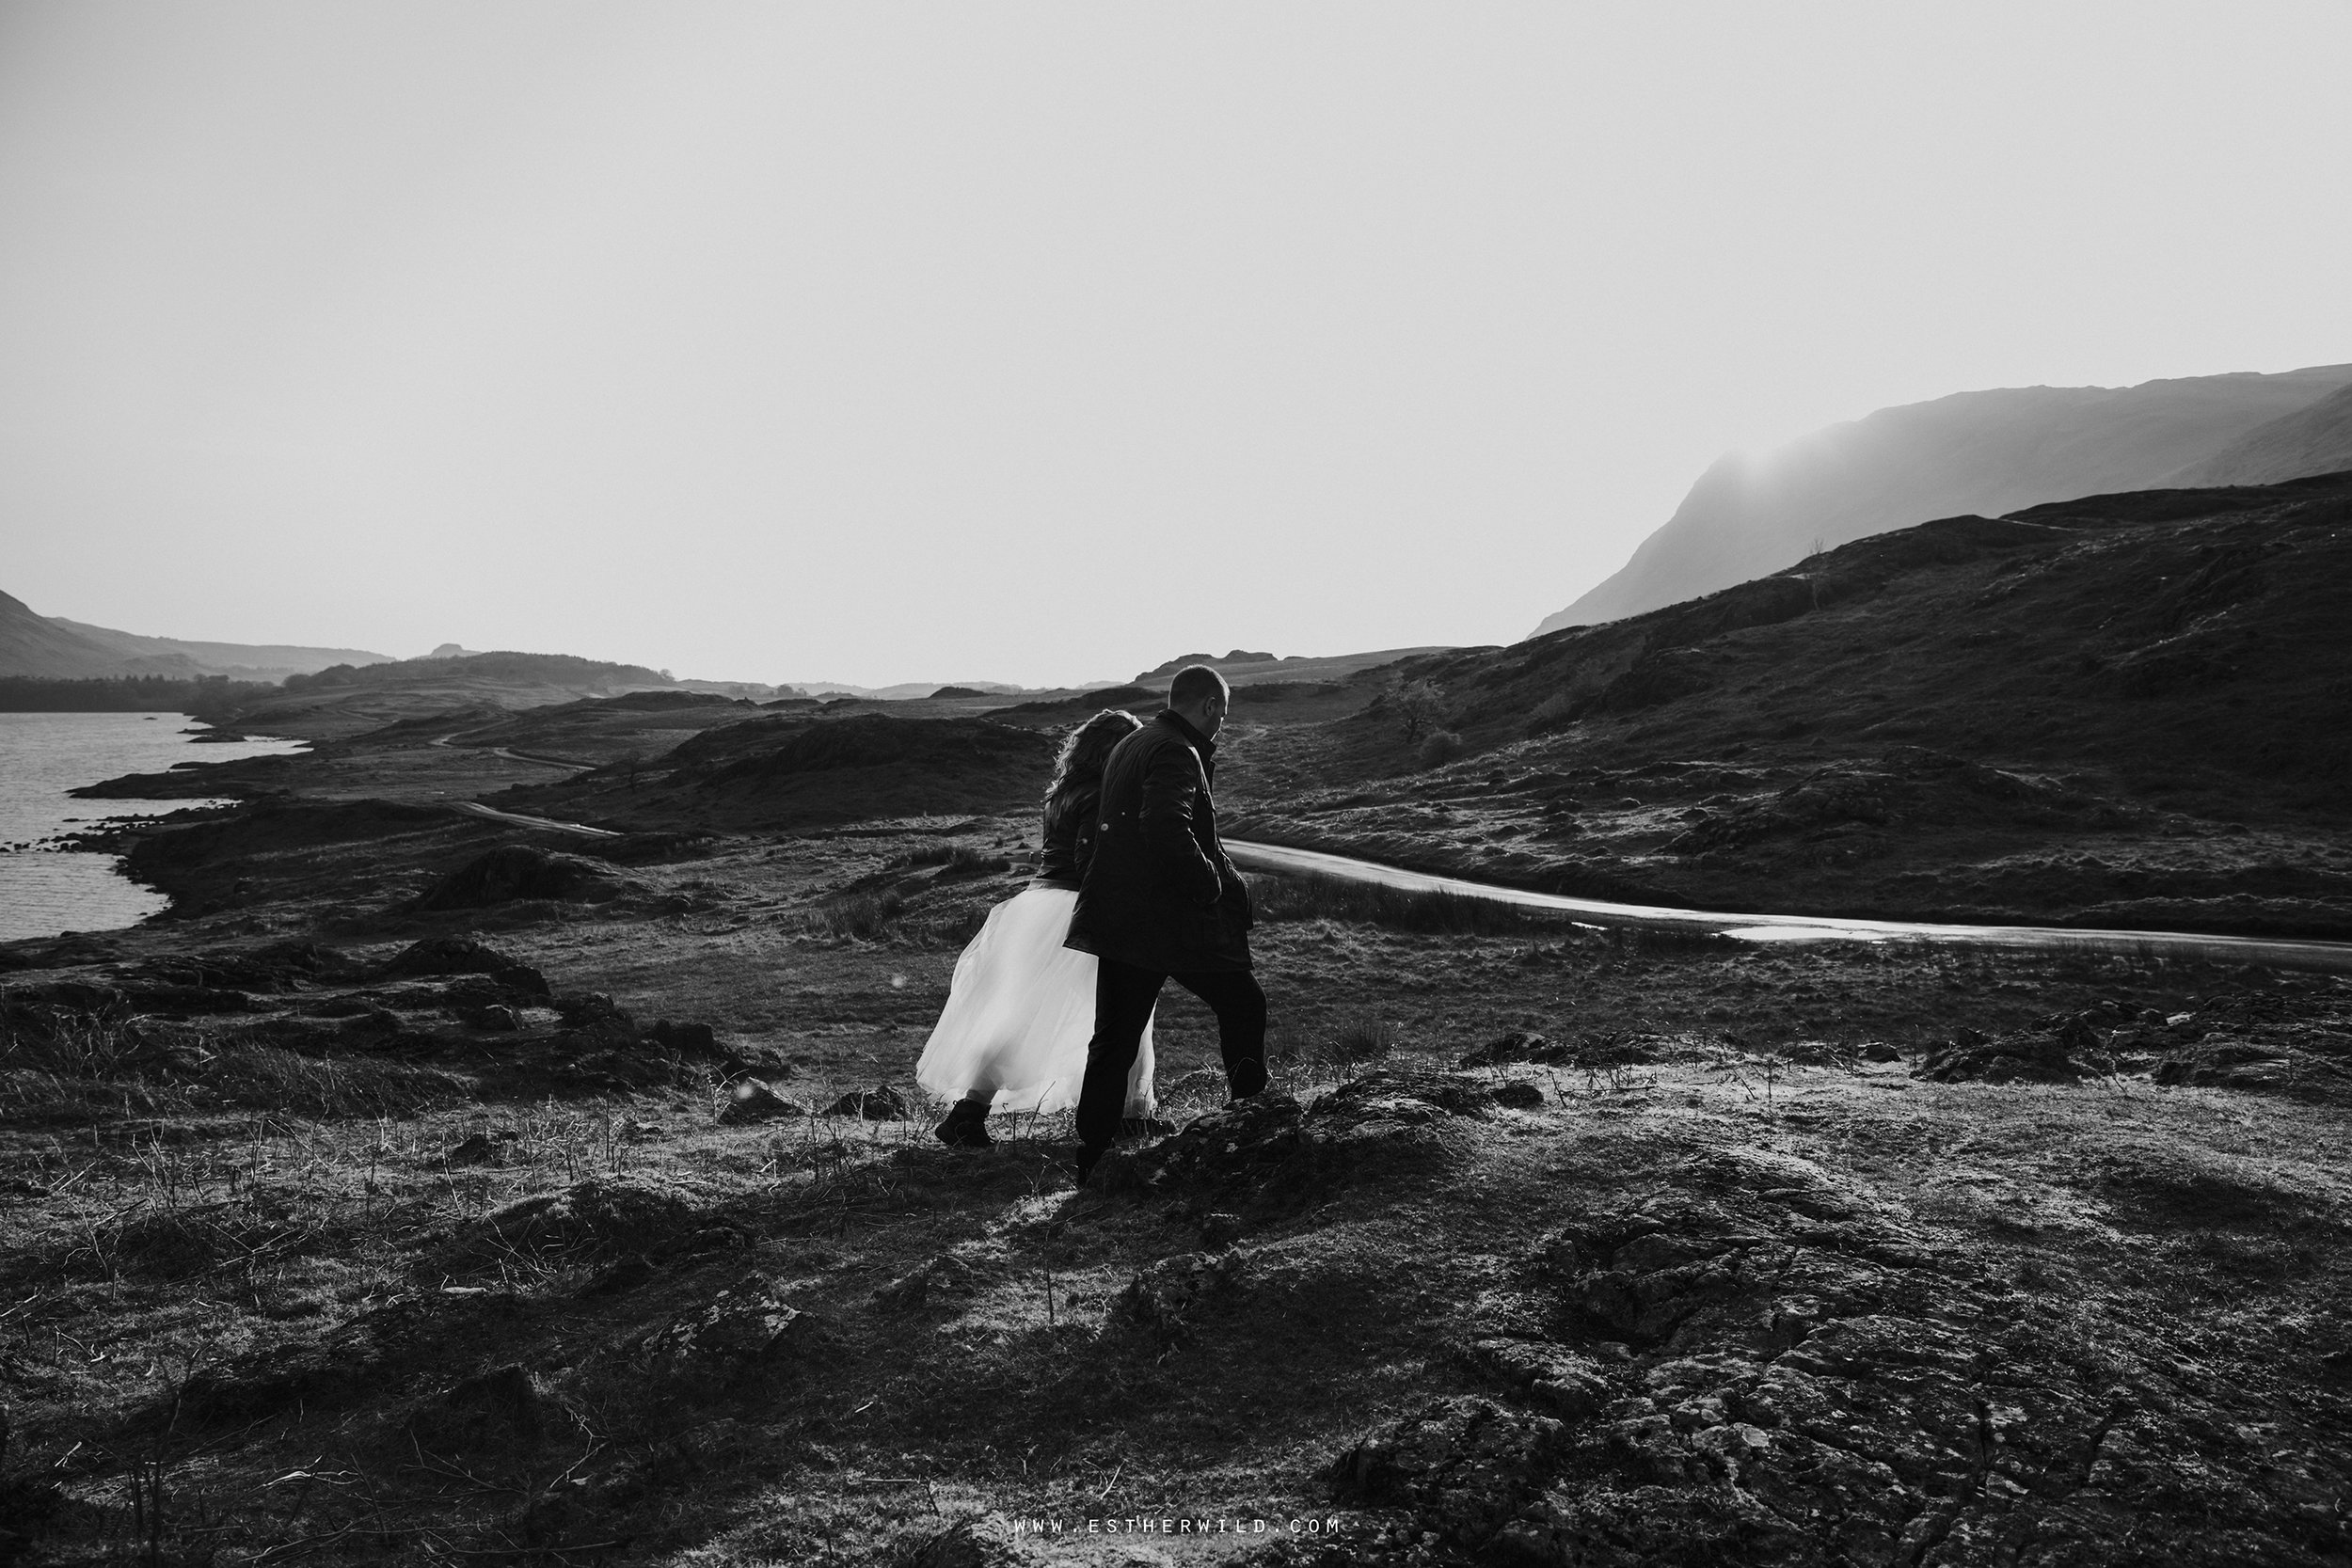 Cumbria_Lake_District_Wasdale_Wedding_Photographer_Destination_Engagement_Anniversary_Esther_Wild_IMG_4514.jpg